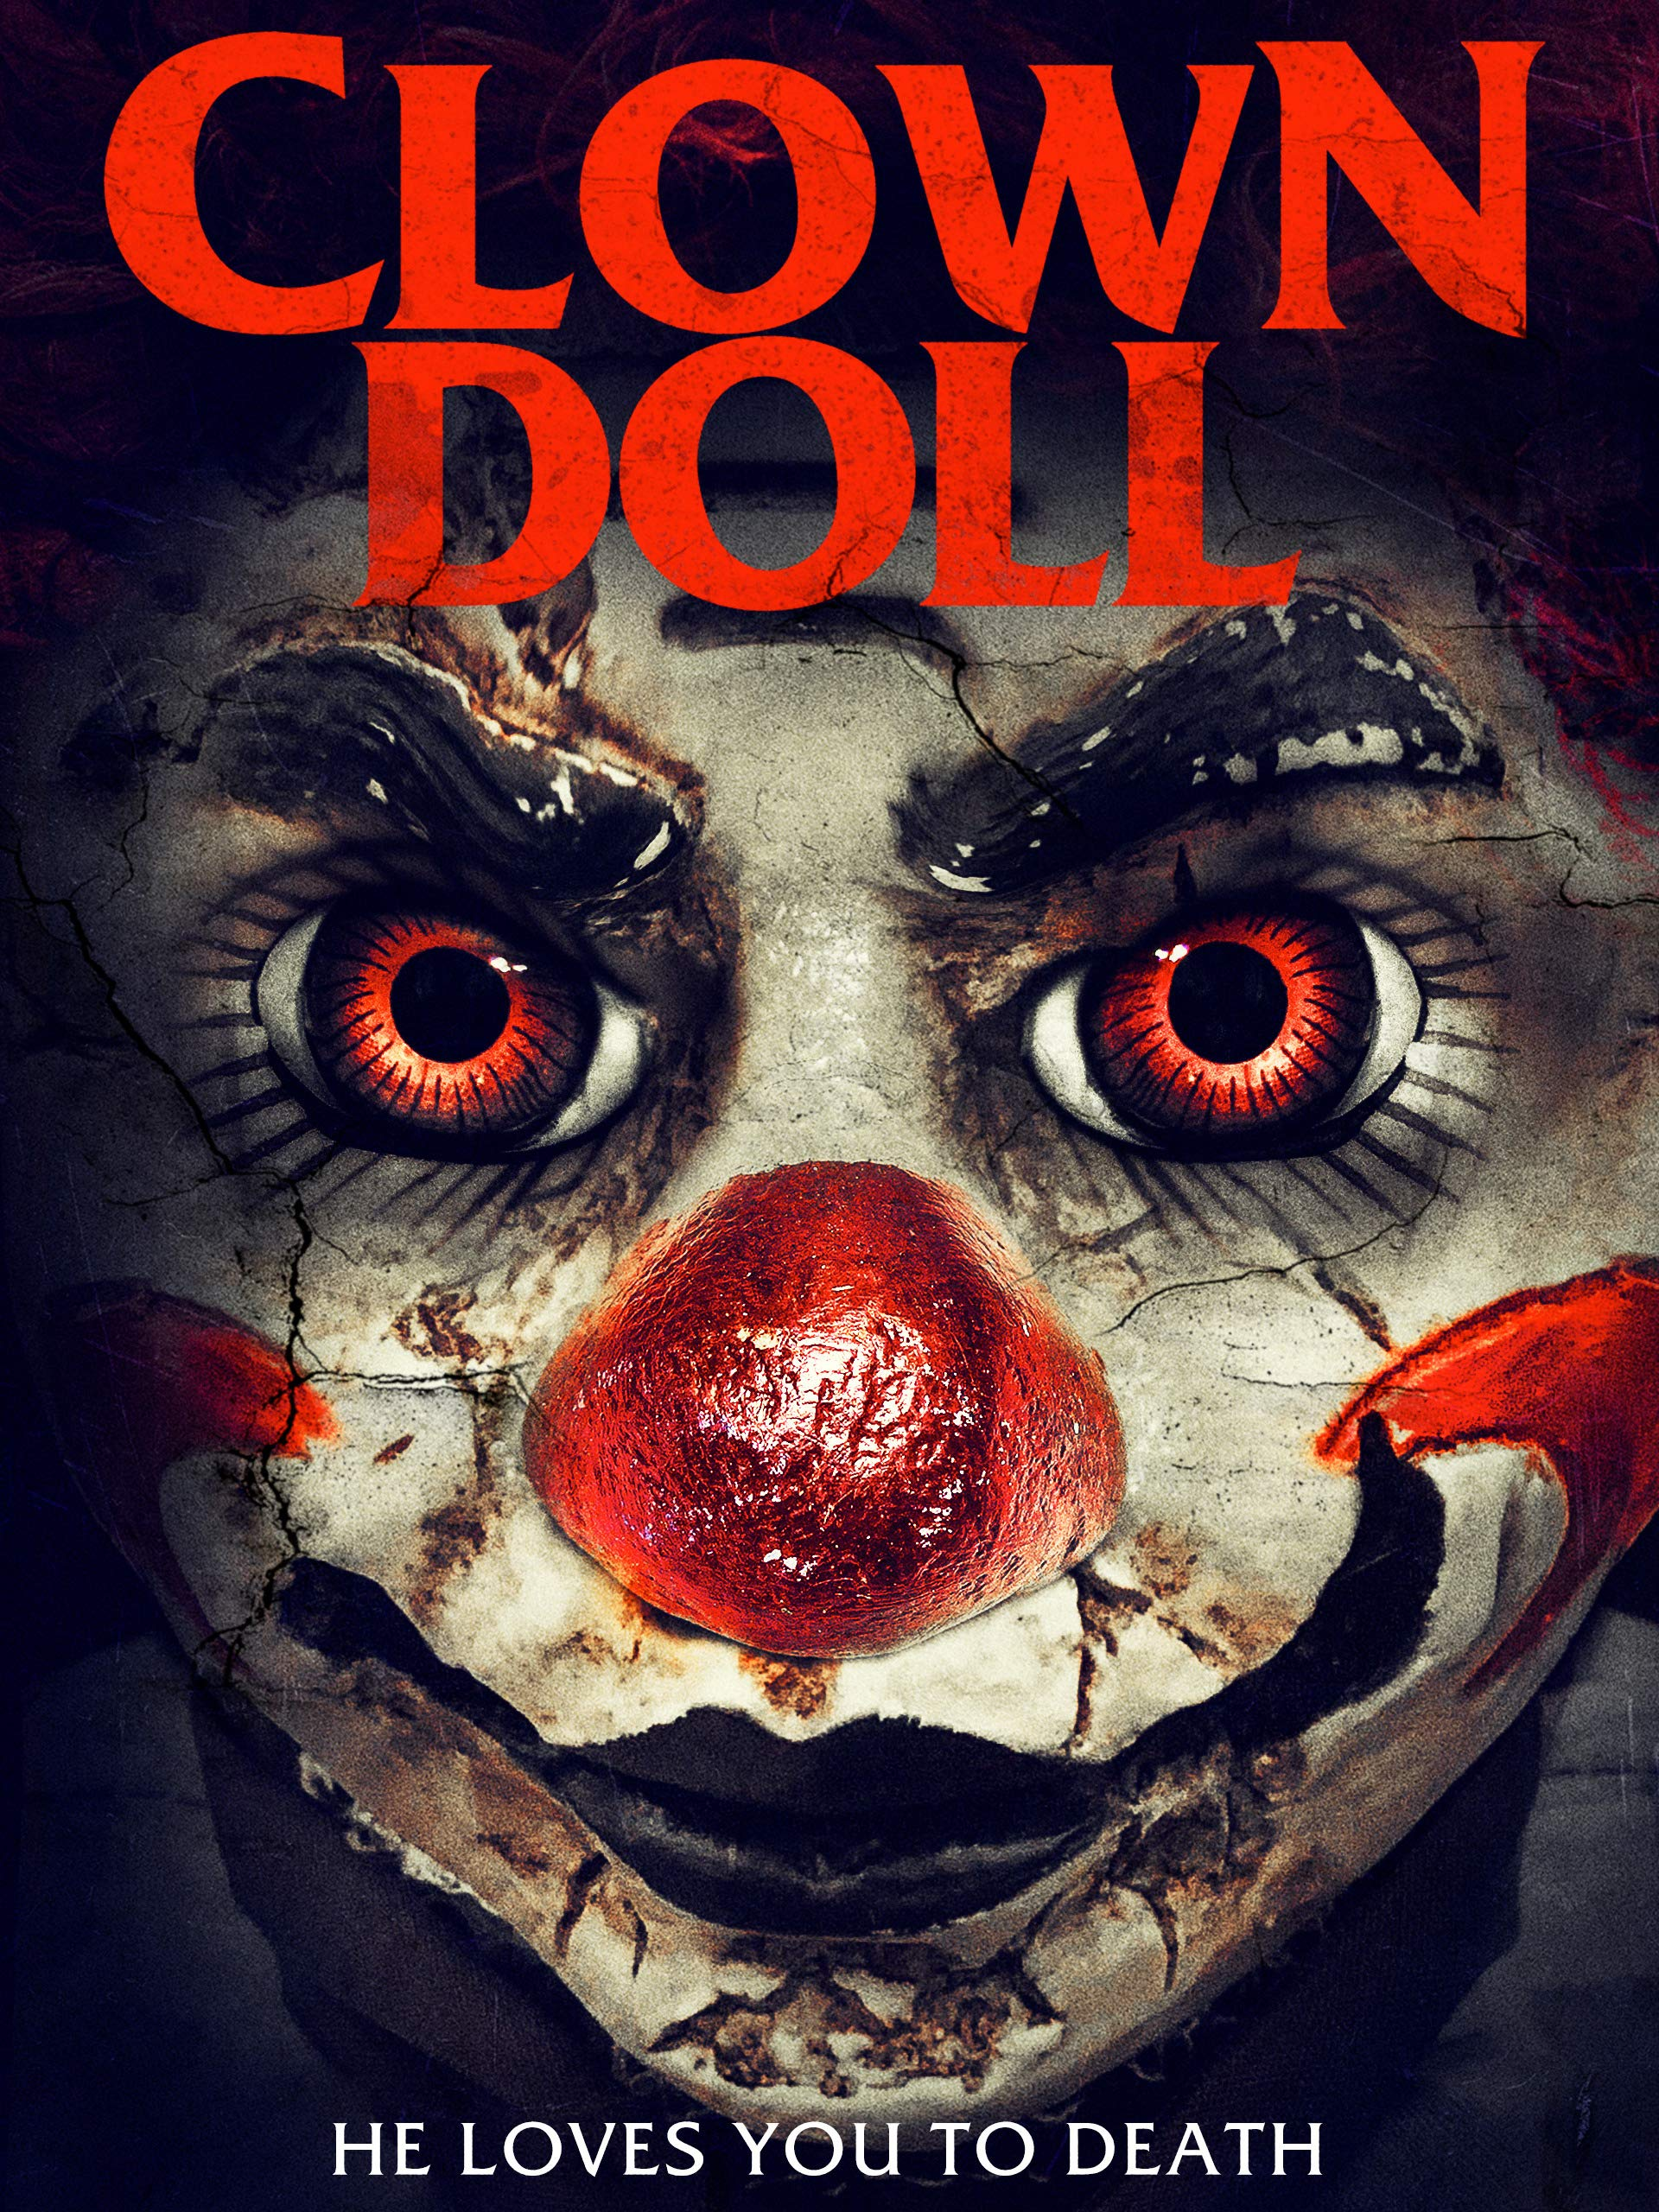 Amazon.de: Clown Doll - He loves you to Death ansehen